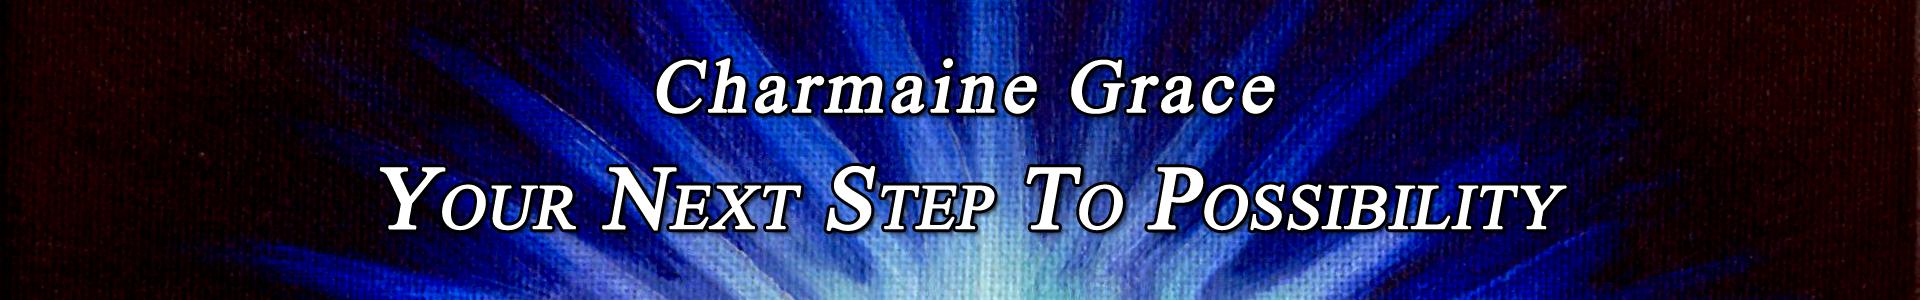 Charmaine Grace